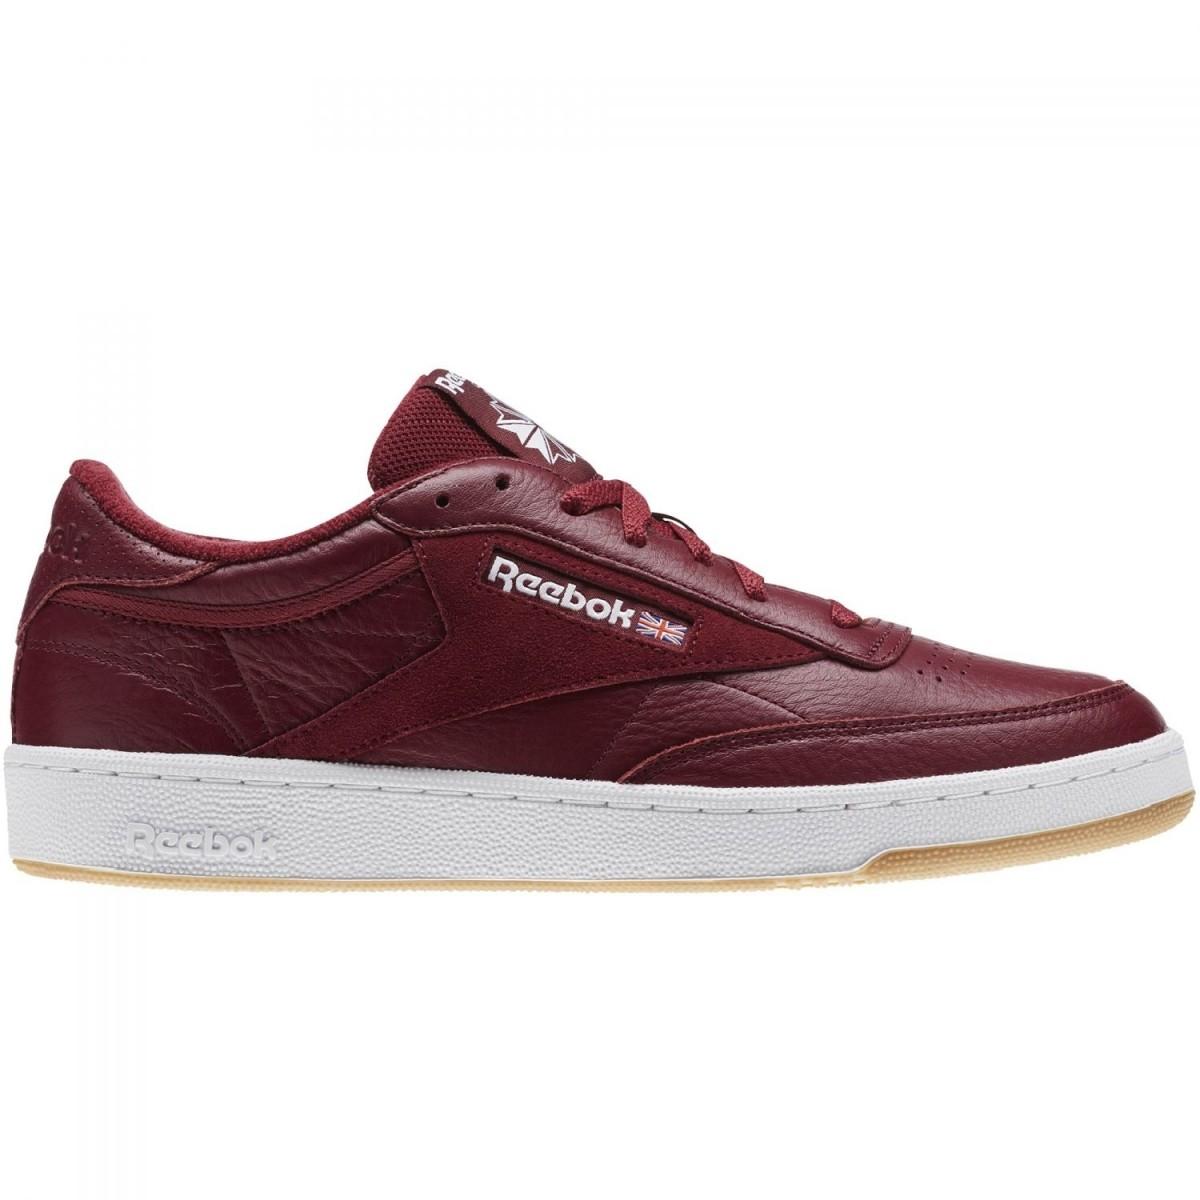 Reebok Club C 85 ESTL Sneaker